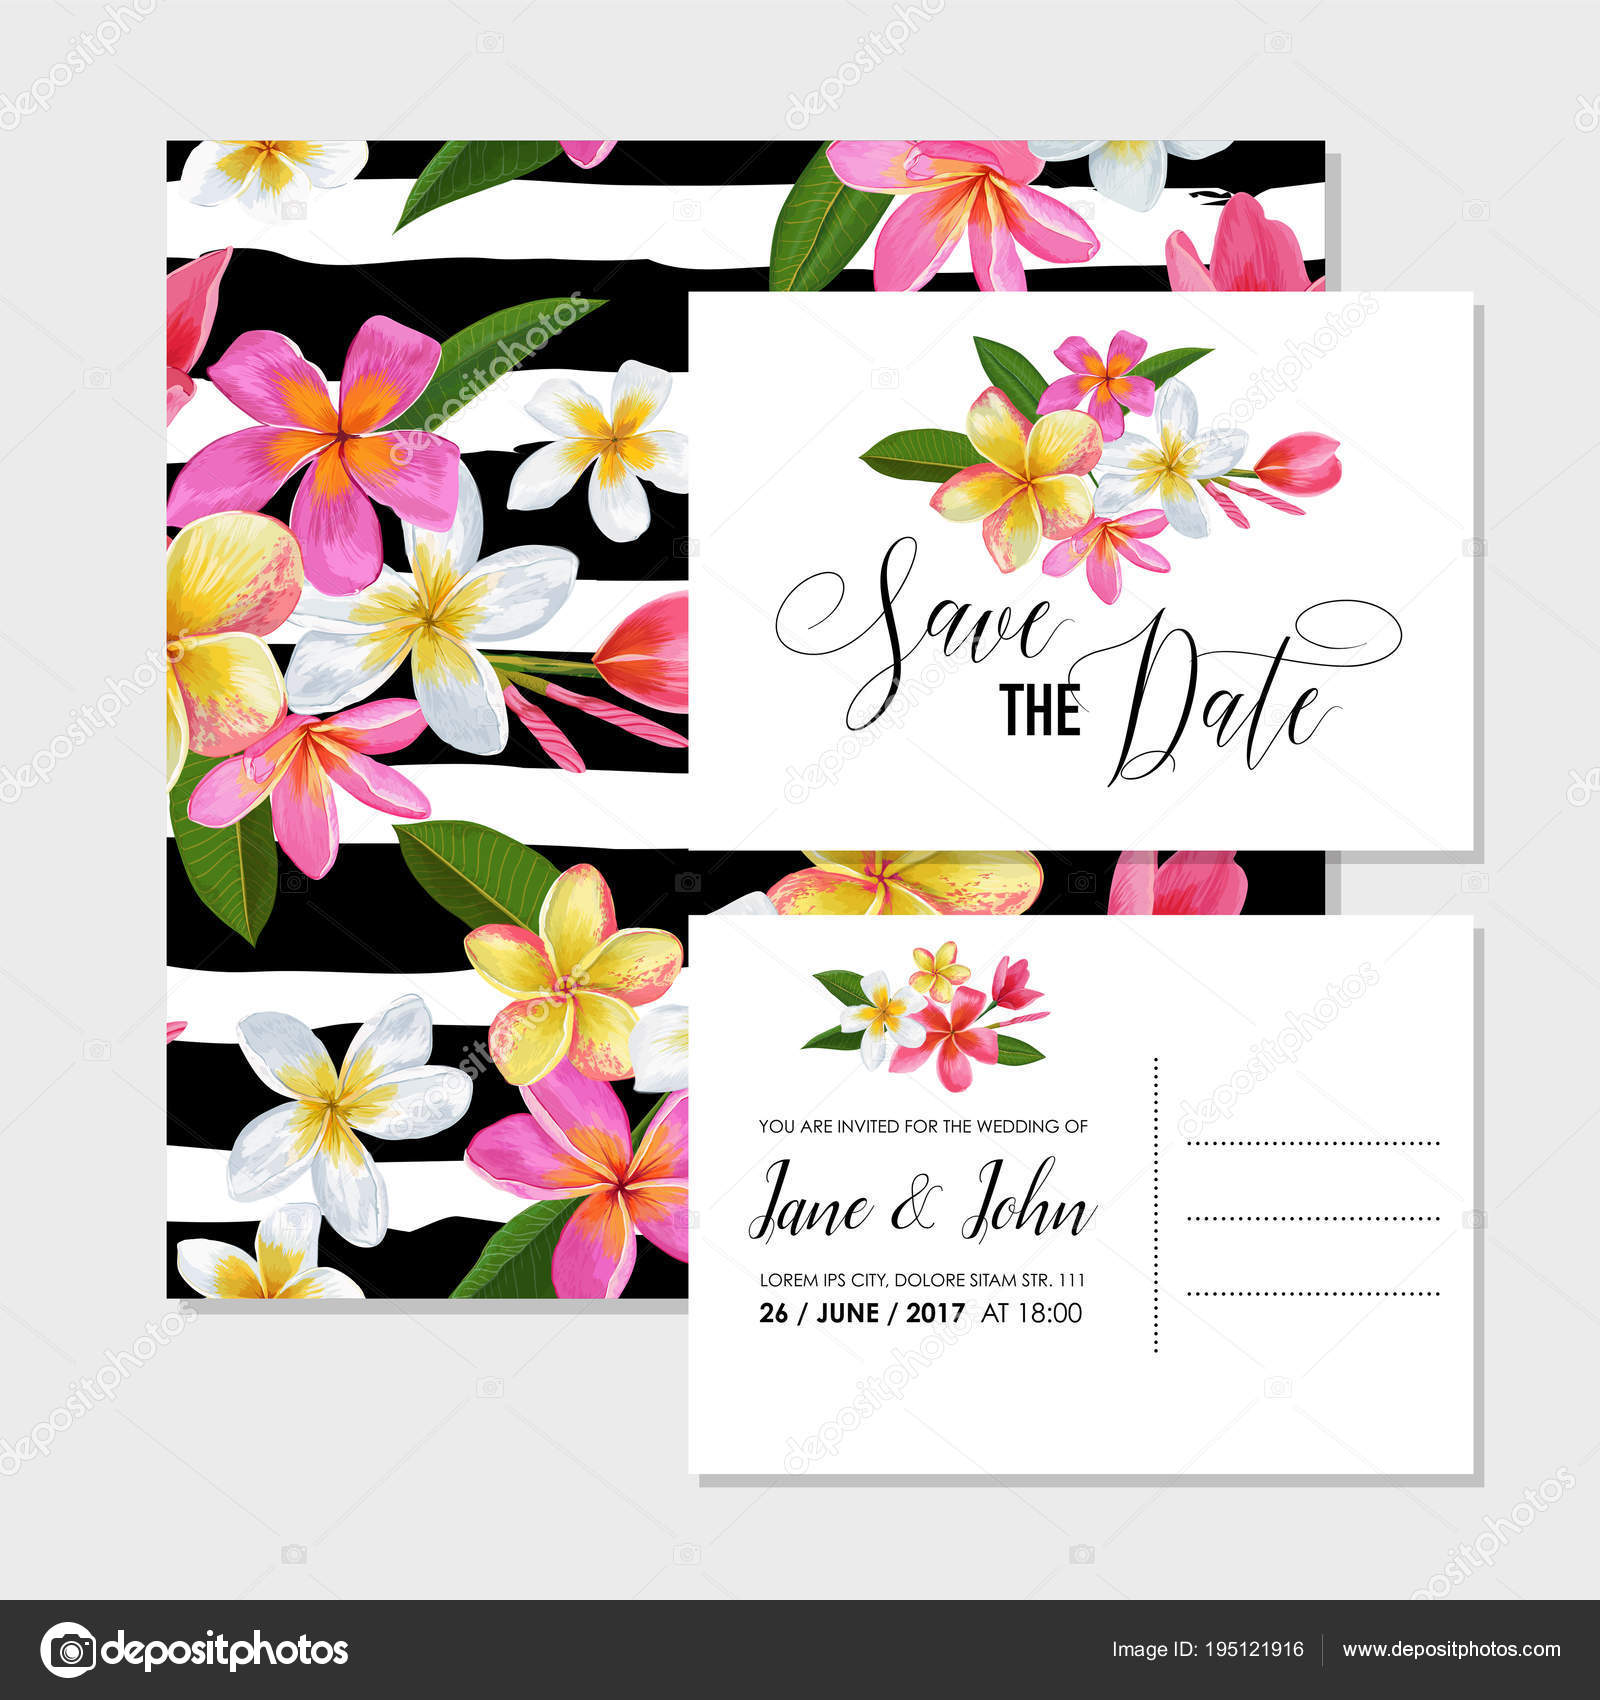 Wedding Invitation Template with Plumeria Flowers — Stock Vector ...